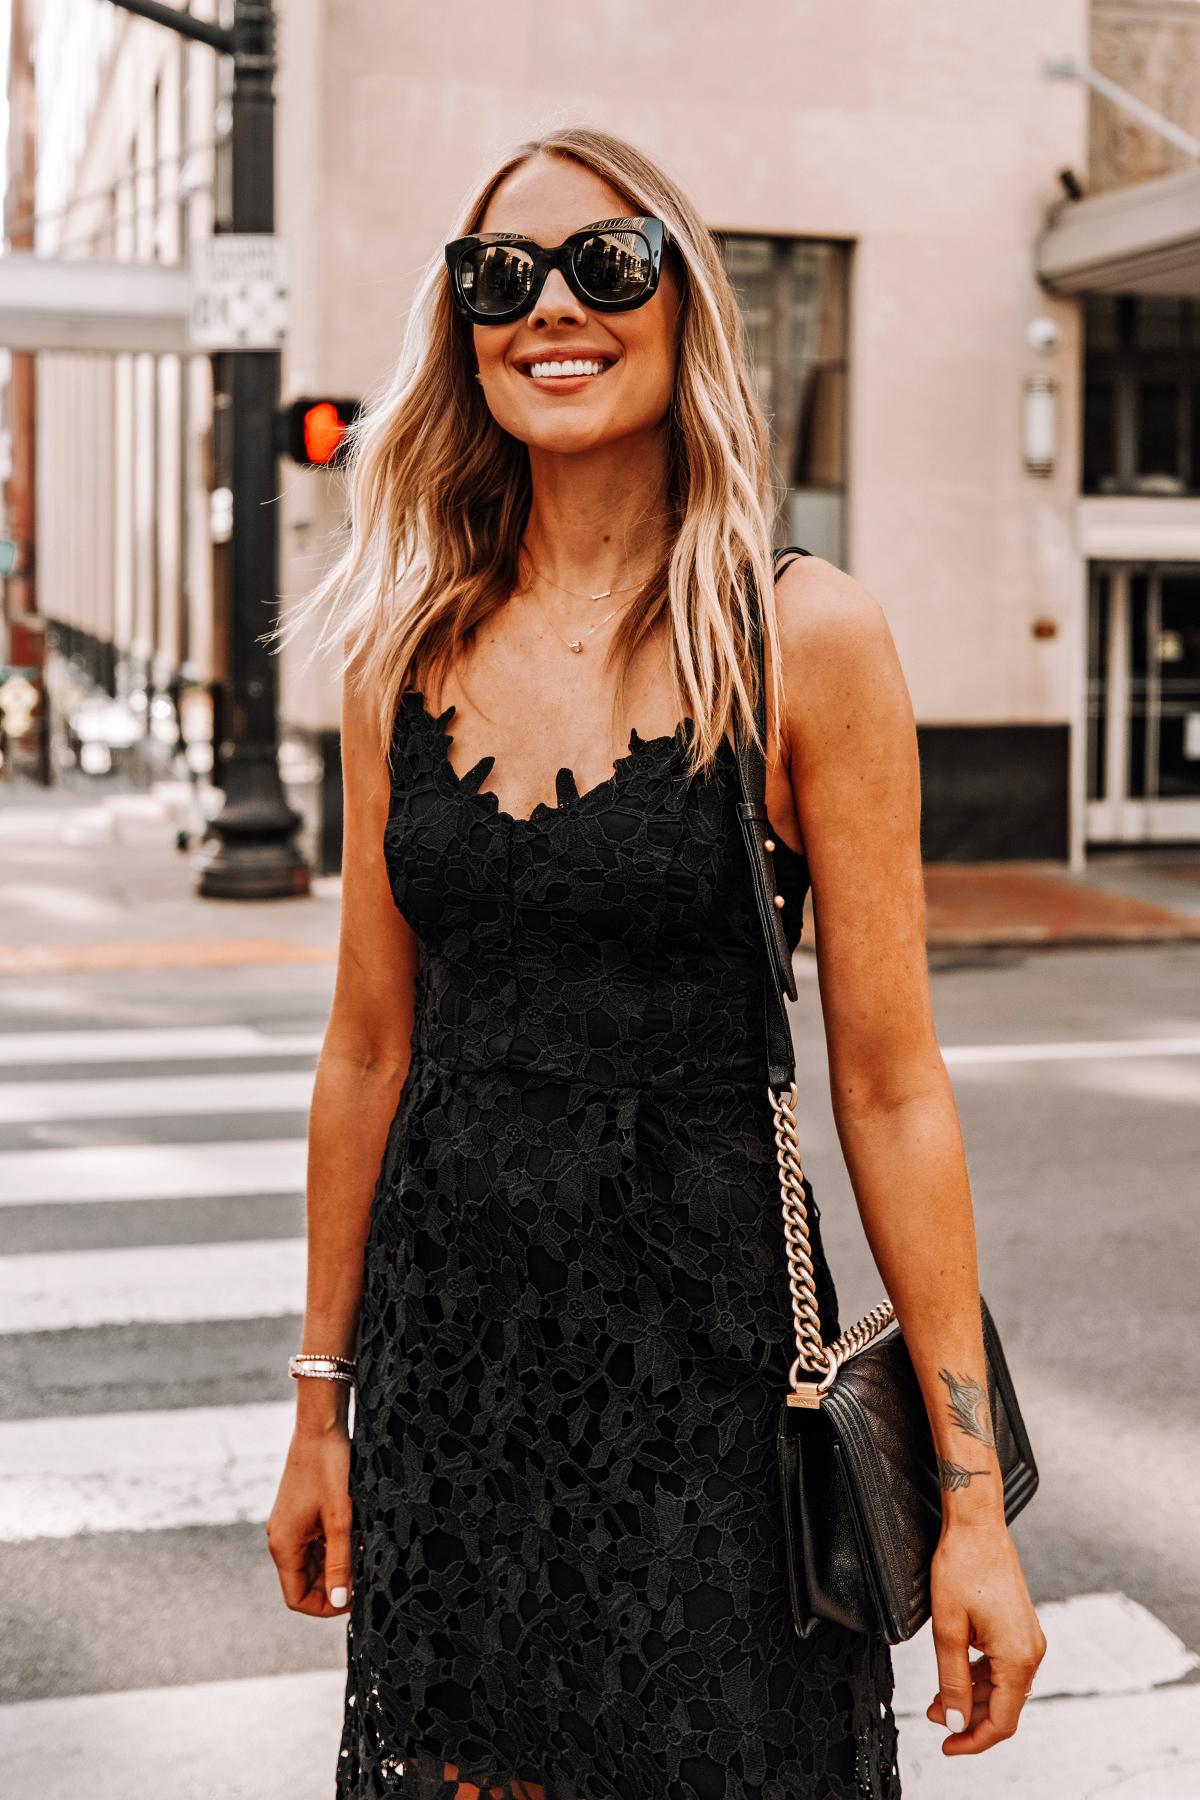 Fashion Jackson Wearing Black Lace Midi Dress Black Celine Sunglasses Cocktail Dress